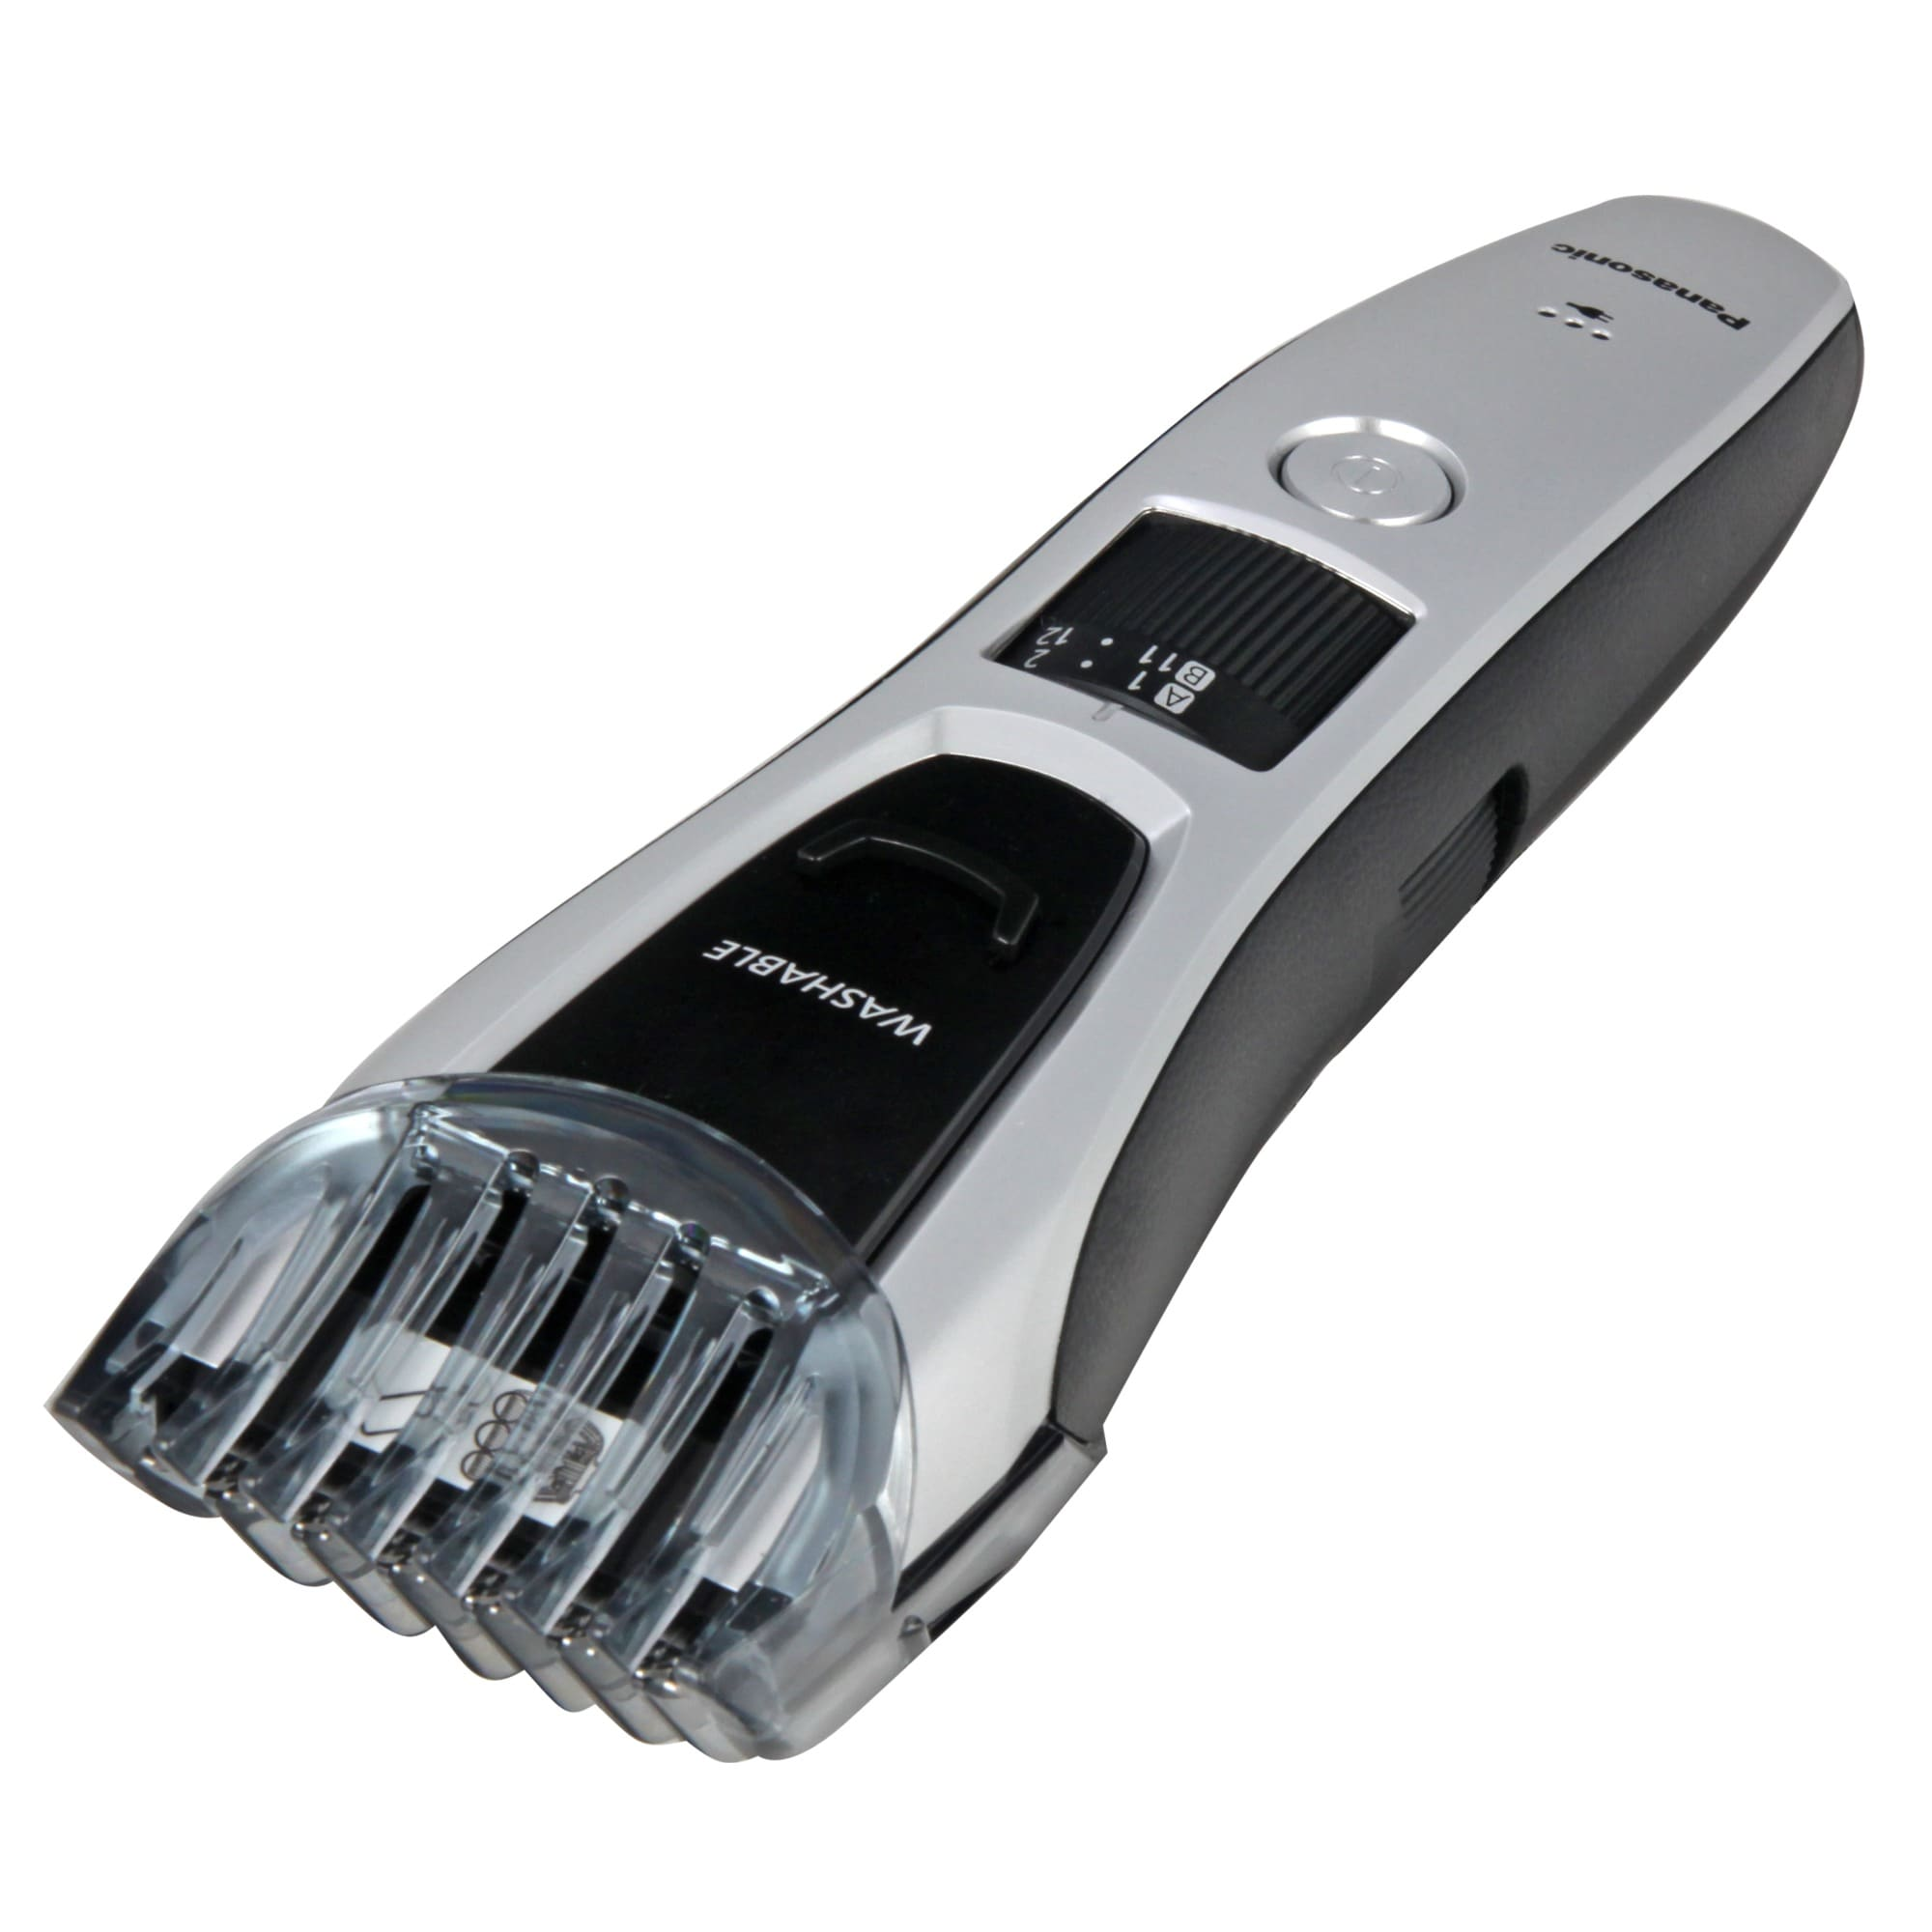 Panasonic Bartschneider ER-GB70-S503